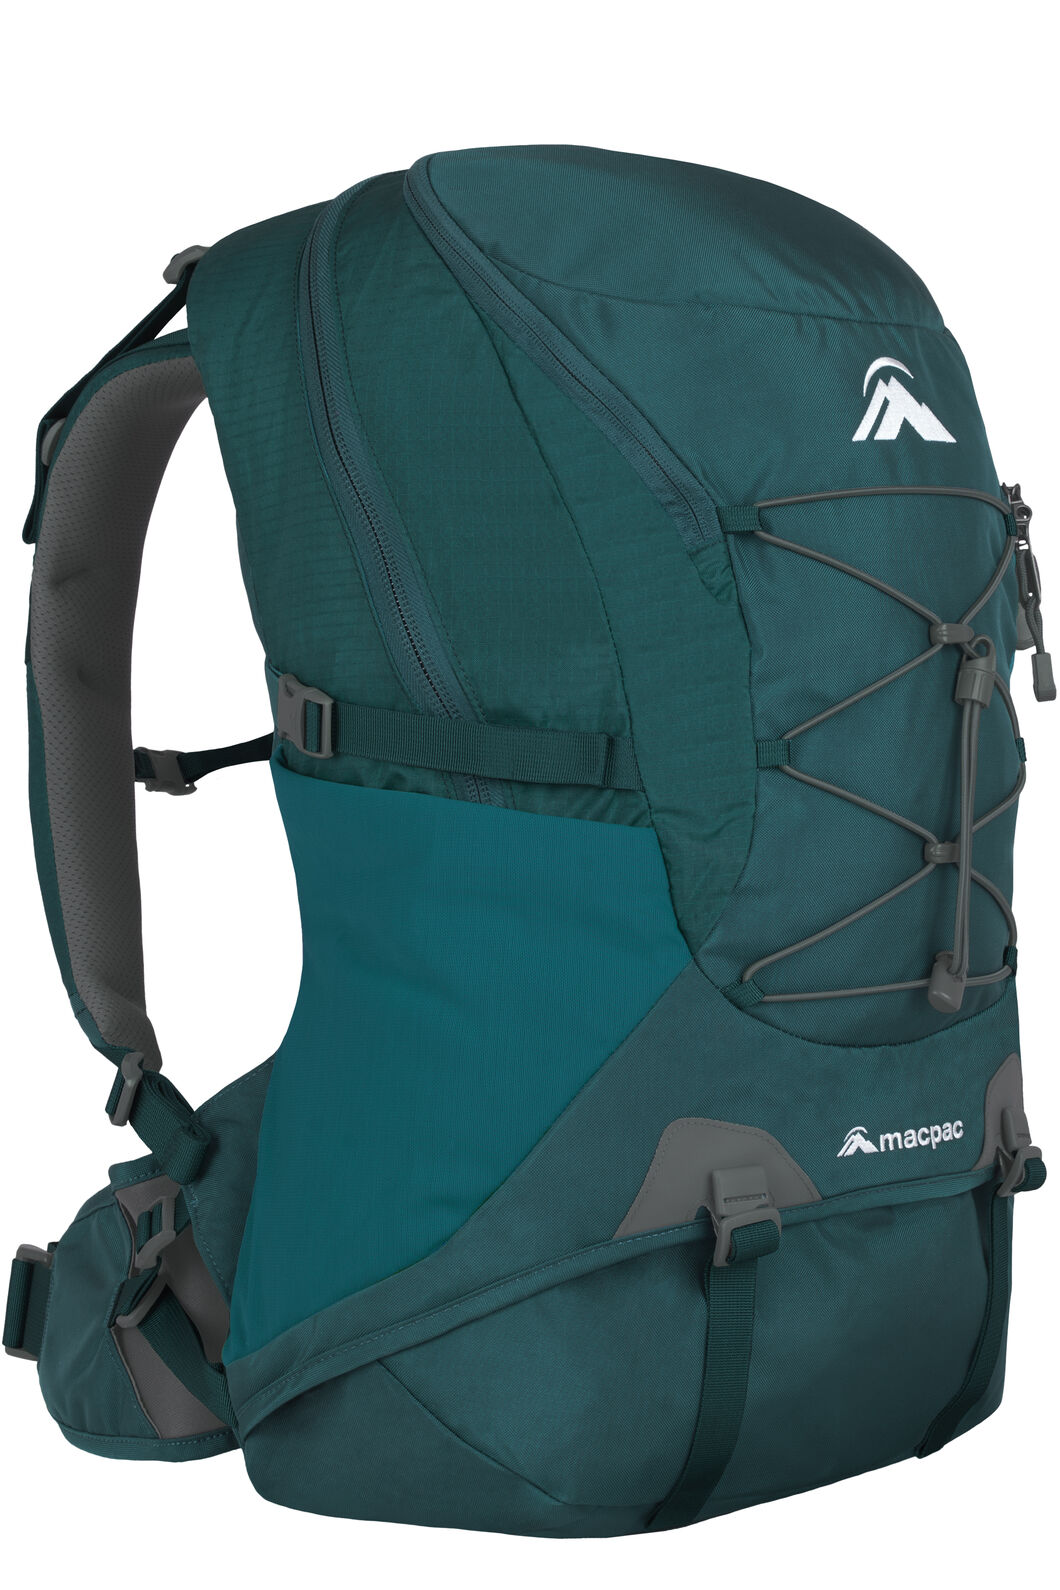 Macpac Voyager 35L Pack, Ocean Depths, hi-res